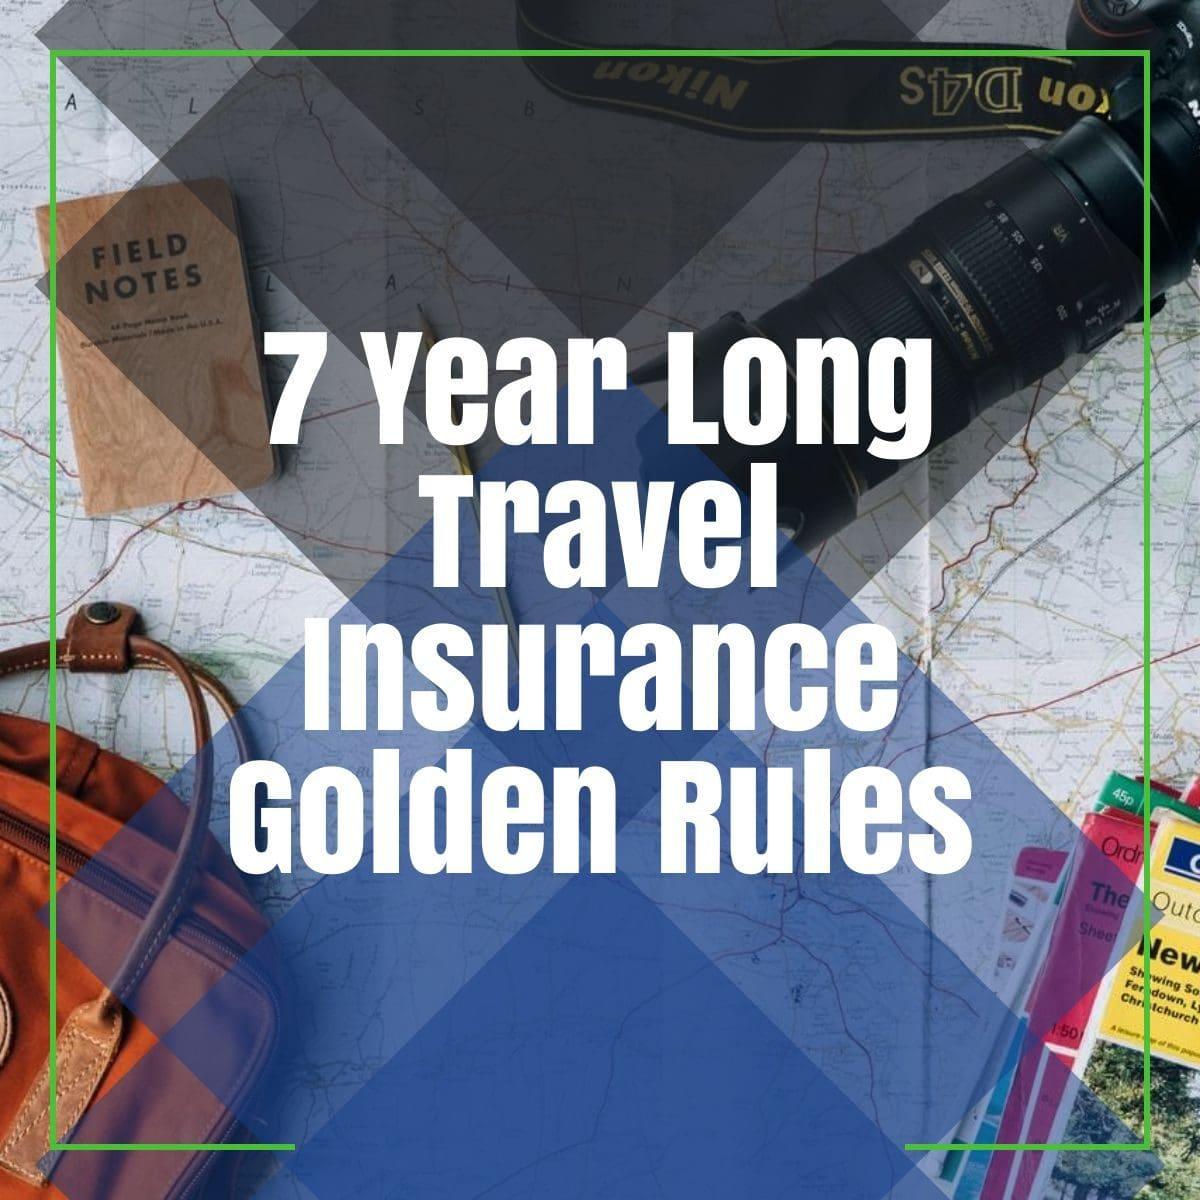 7 year long travel insurance golden rules